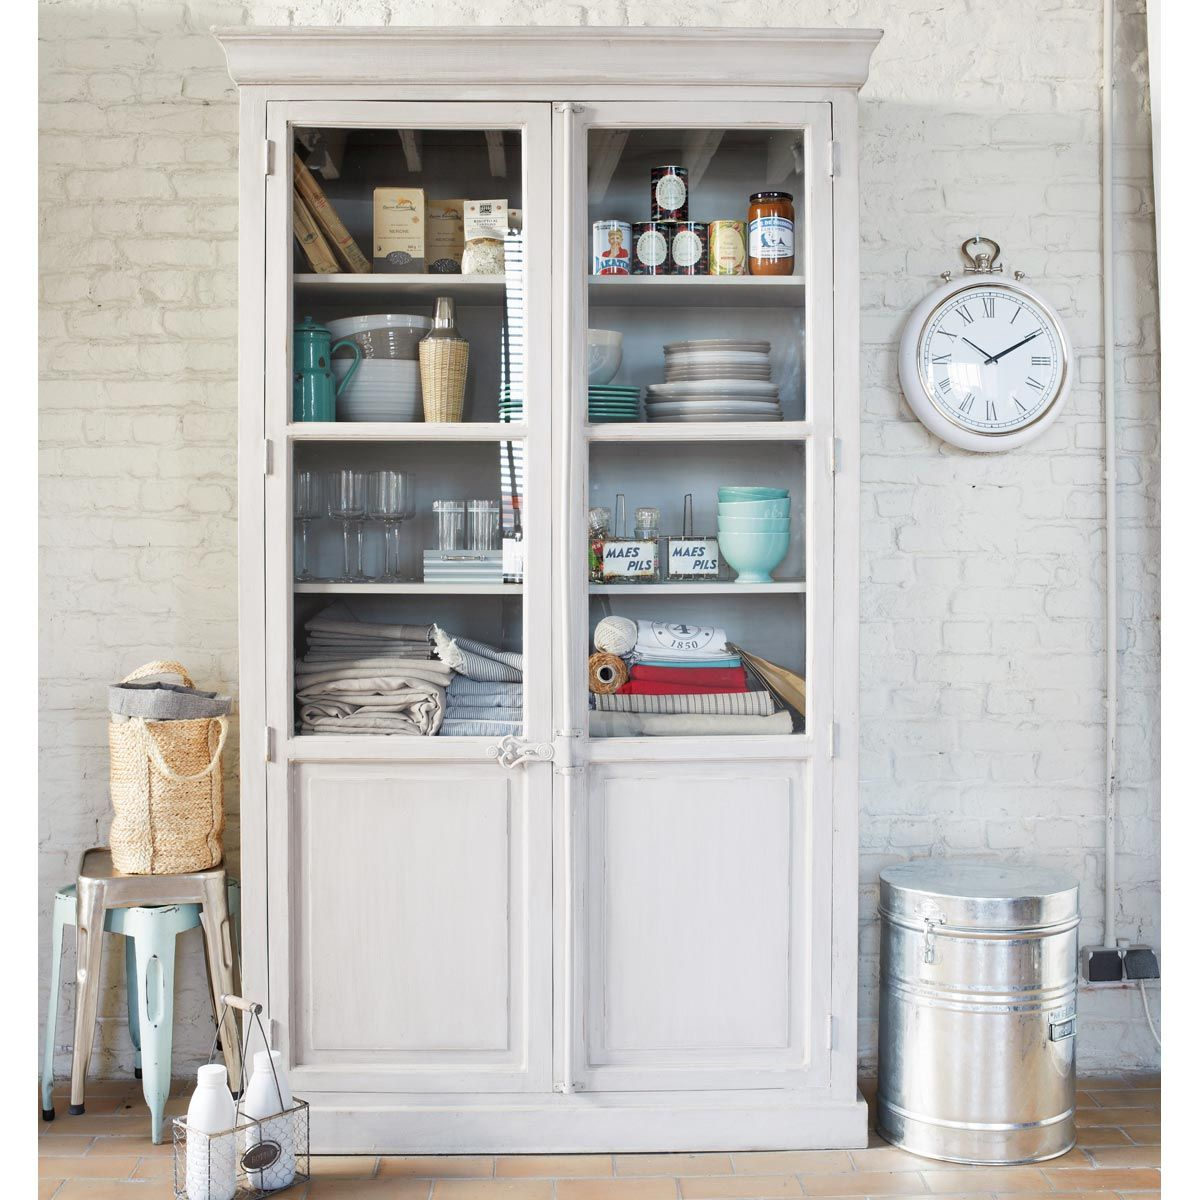 Vitrina blanca martigues home pinterest vitrinas - Muebles el rastro ...